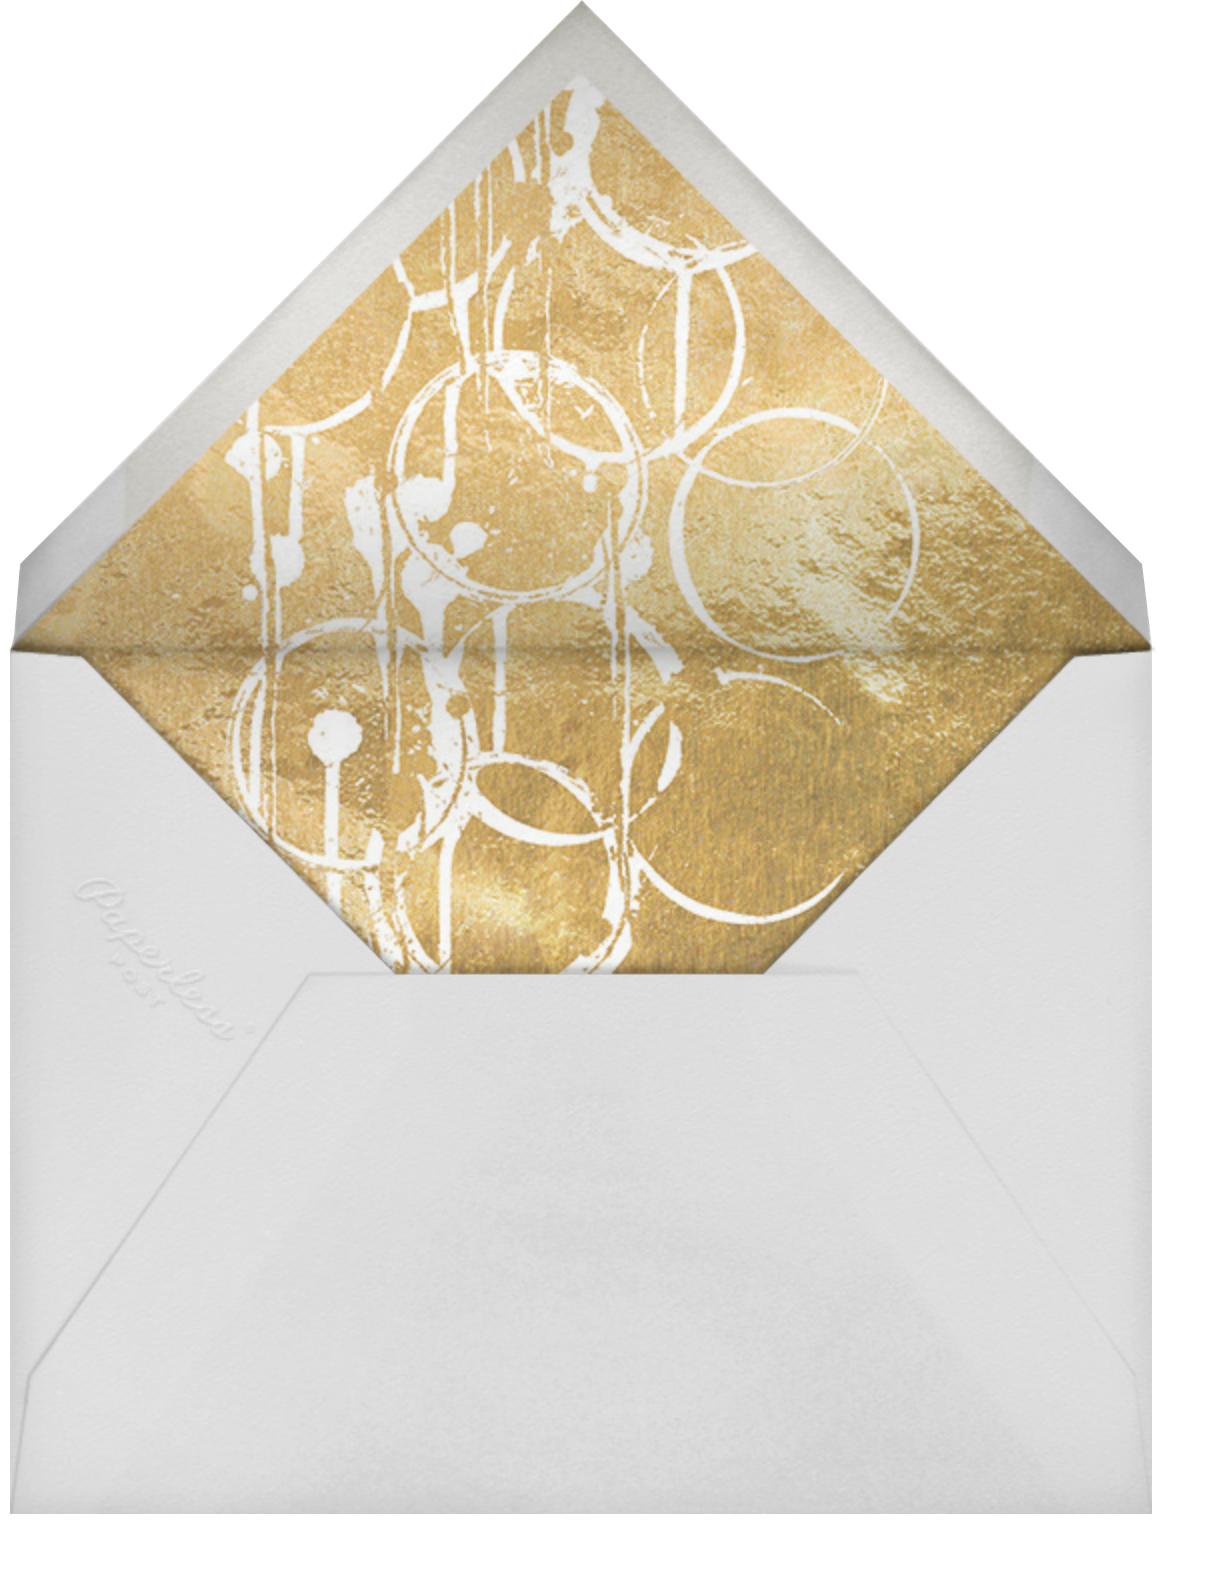 Bottle Shock - Gold - Kelly Wearstler - Bachelorette party - envelope back